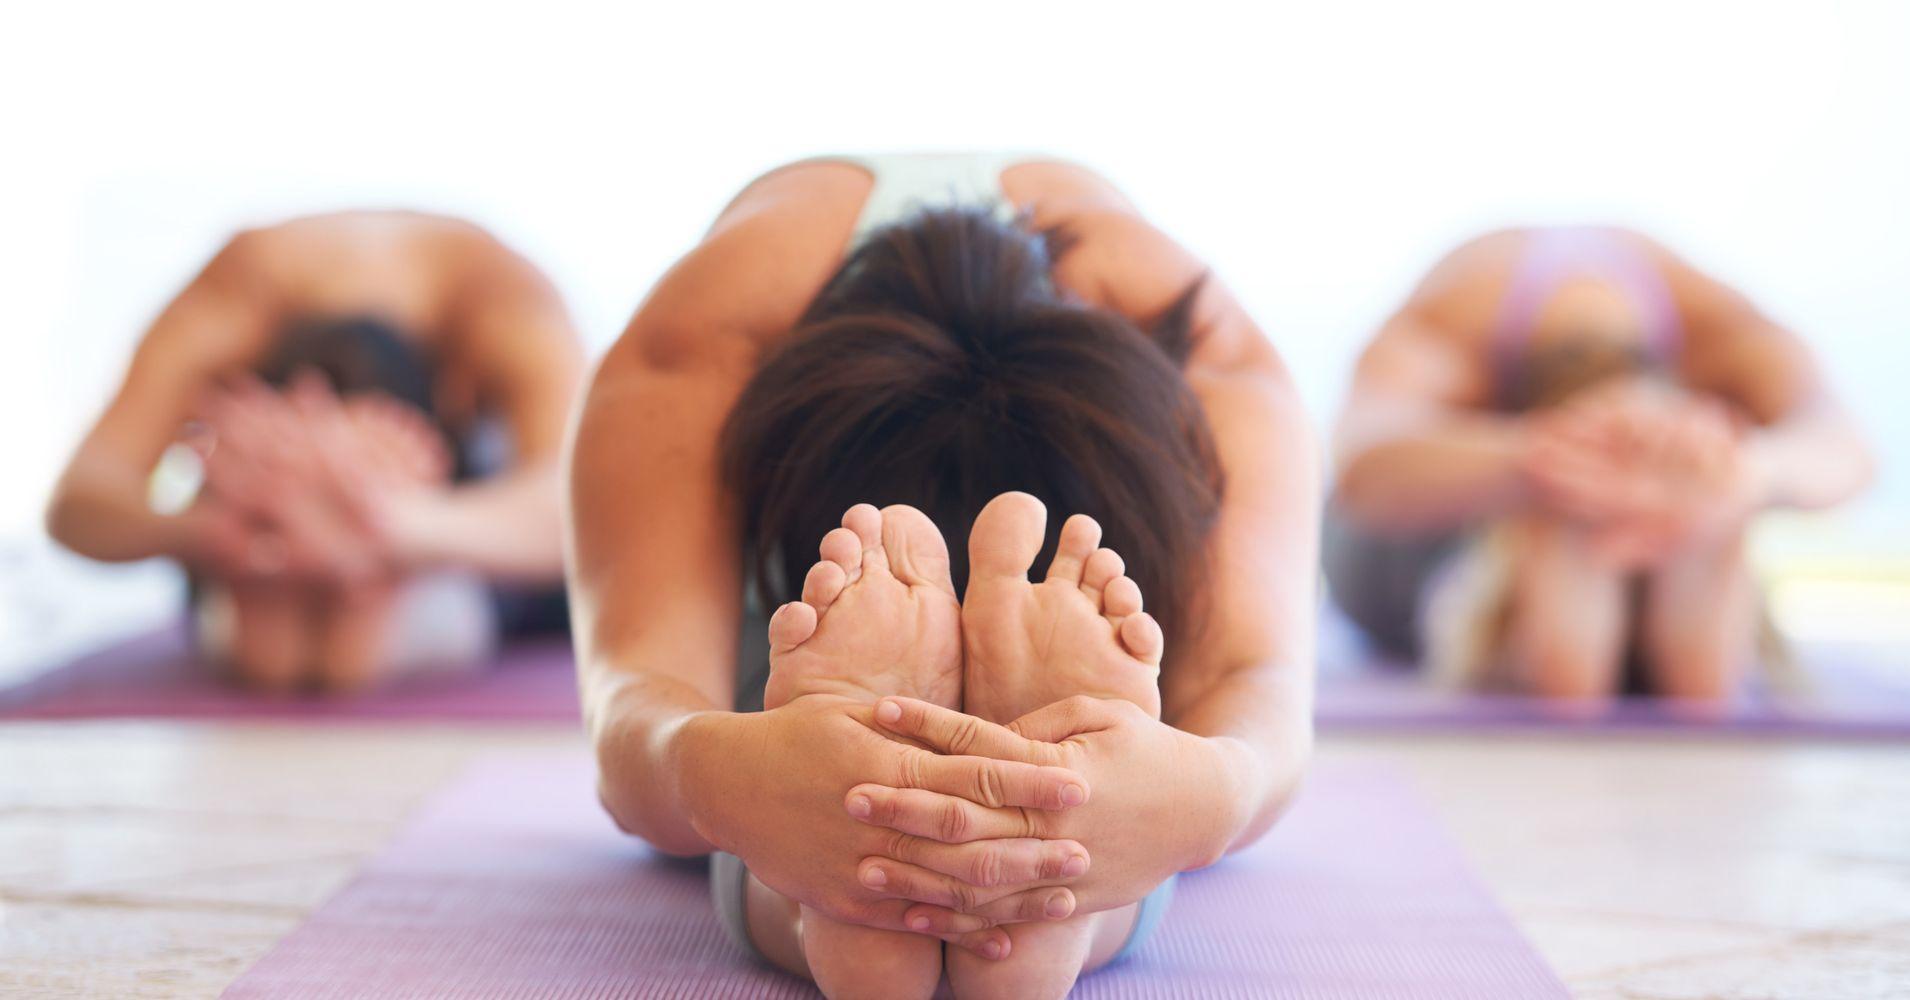 How Yoga Instructors Can Support Sexual Assault Survivors